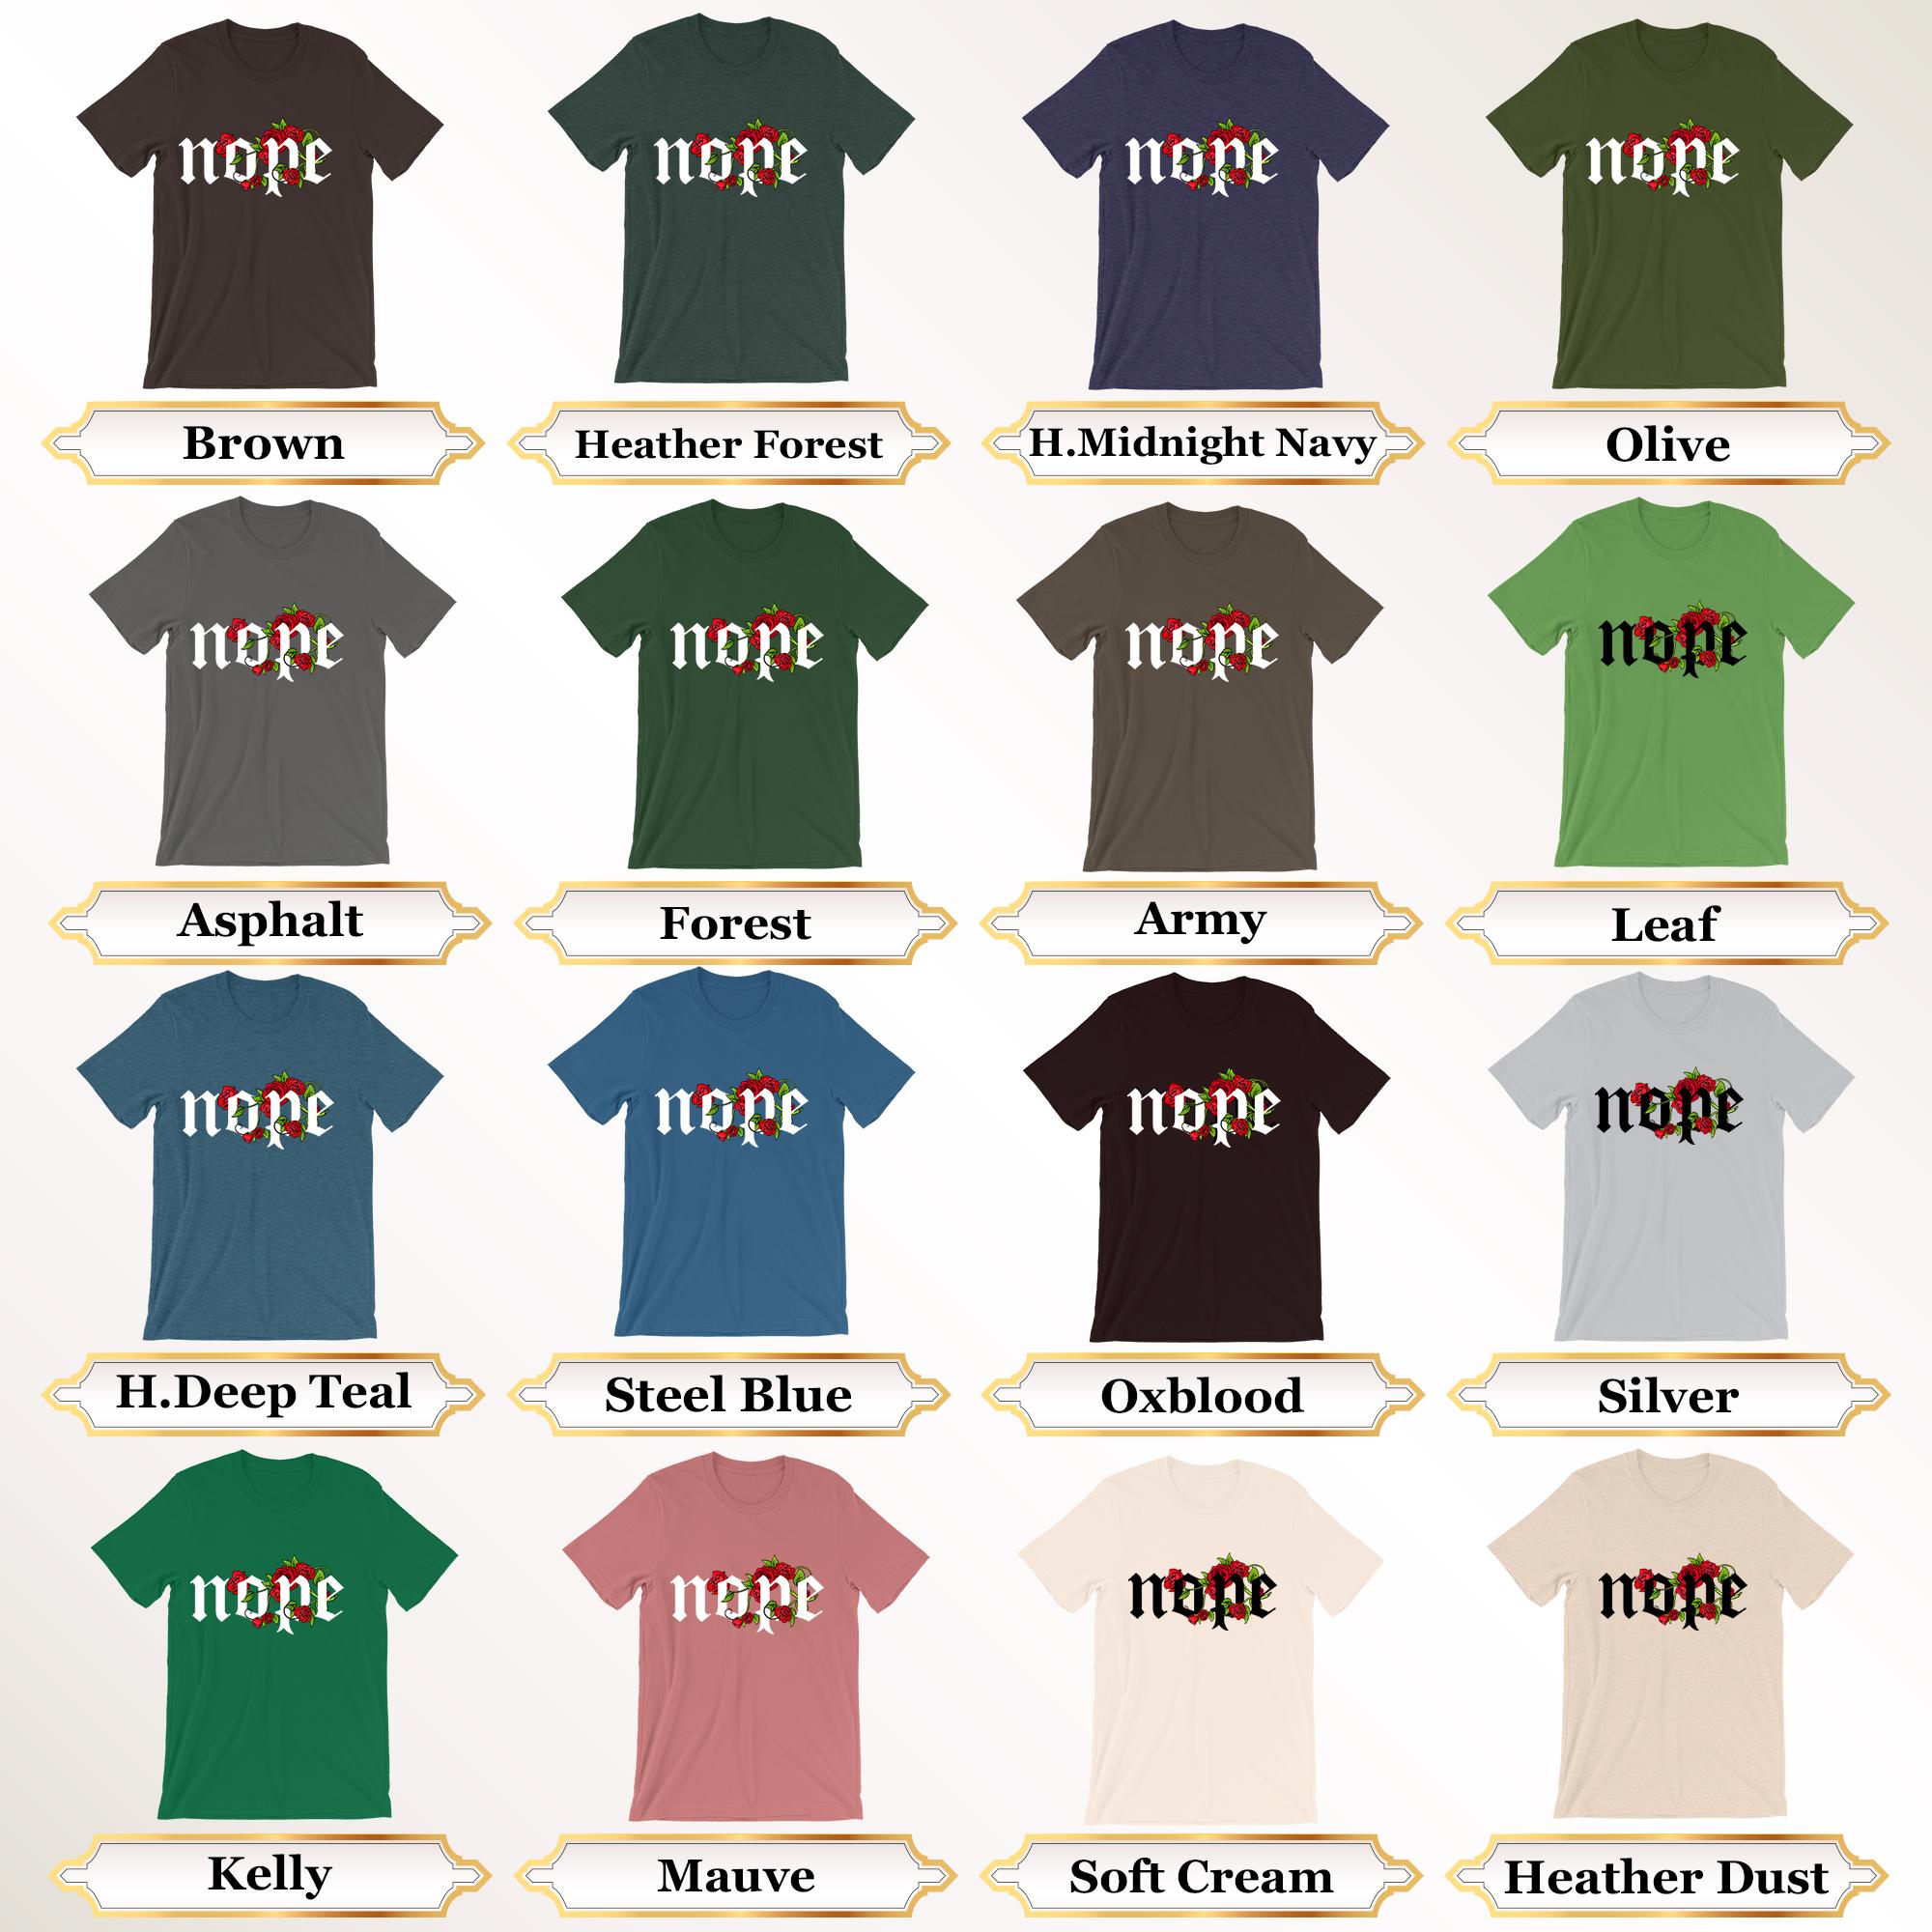 Nope Shirt, Attitude Shirt, Funny Shirt, Nope Tshirt